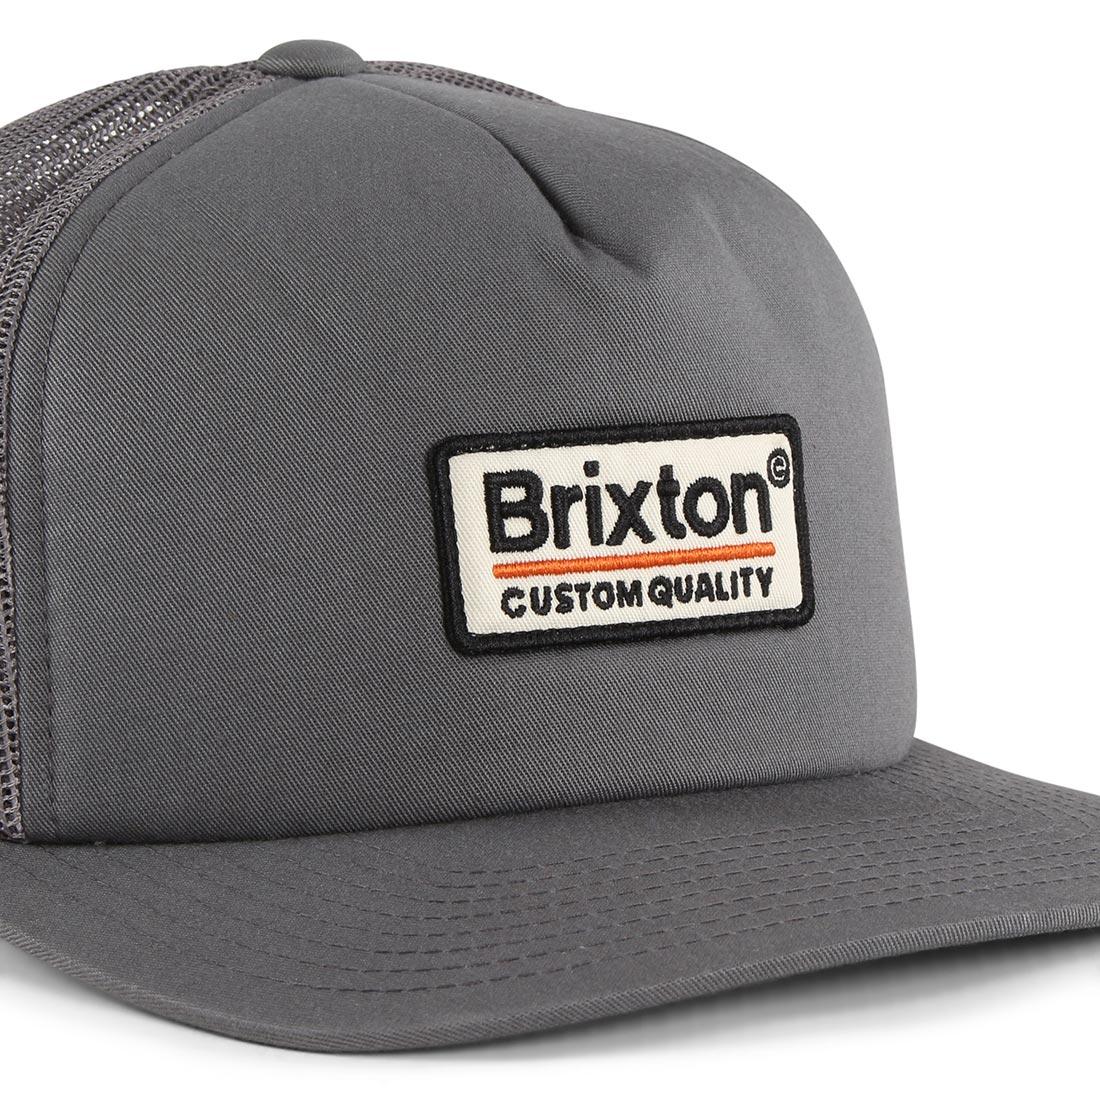 7f8ee5bf2395c Brixton-Palmer-Mesh-Back-Cap-Grey-03